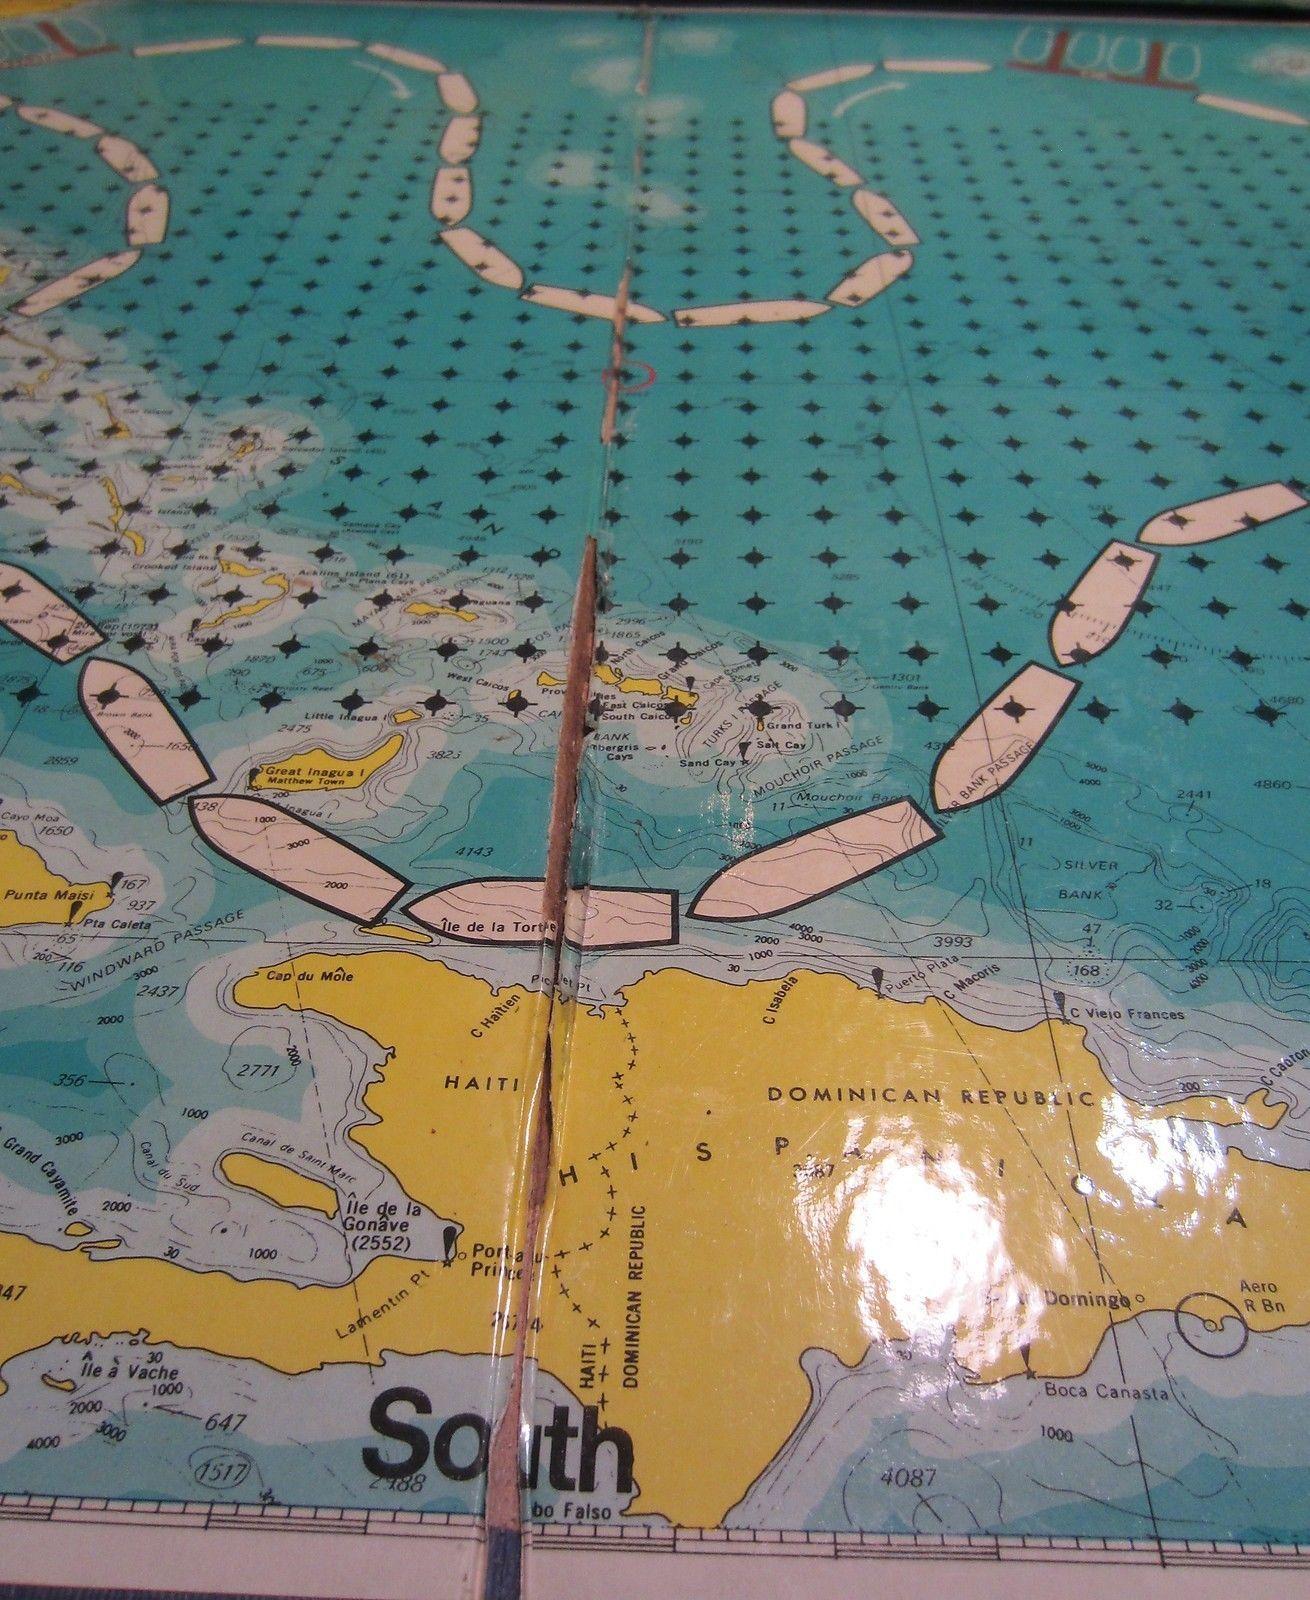 Vintage  Bermuda Triangle board game - complete image 2